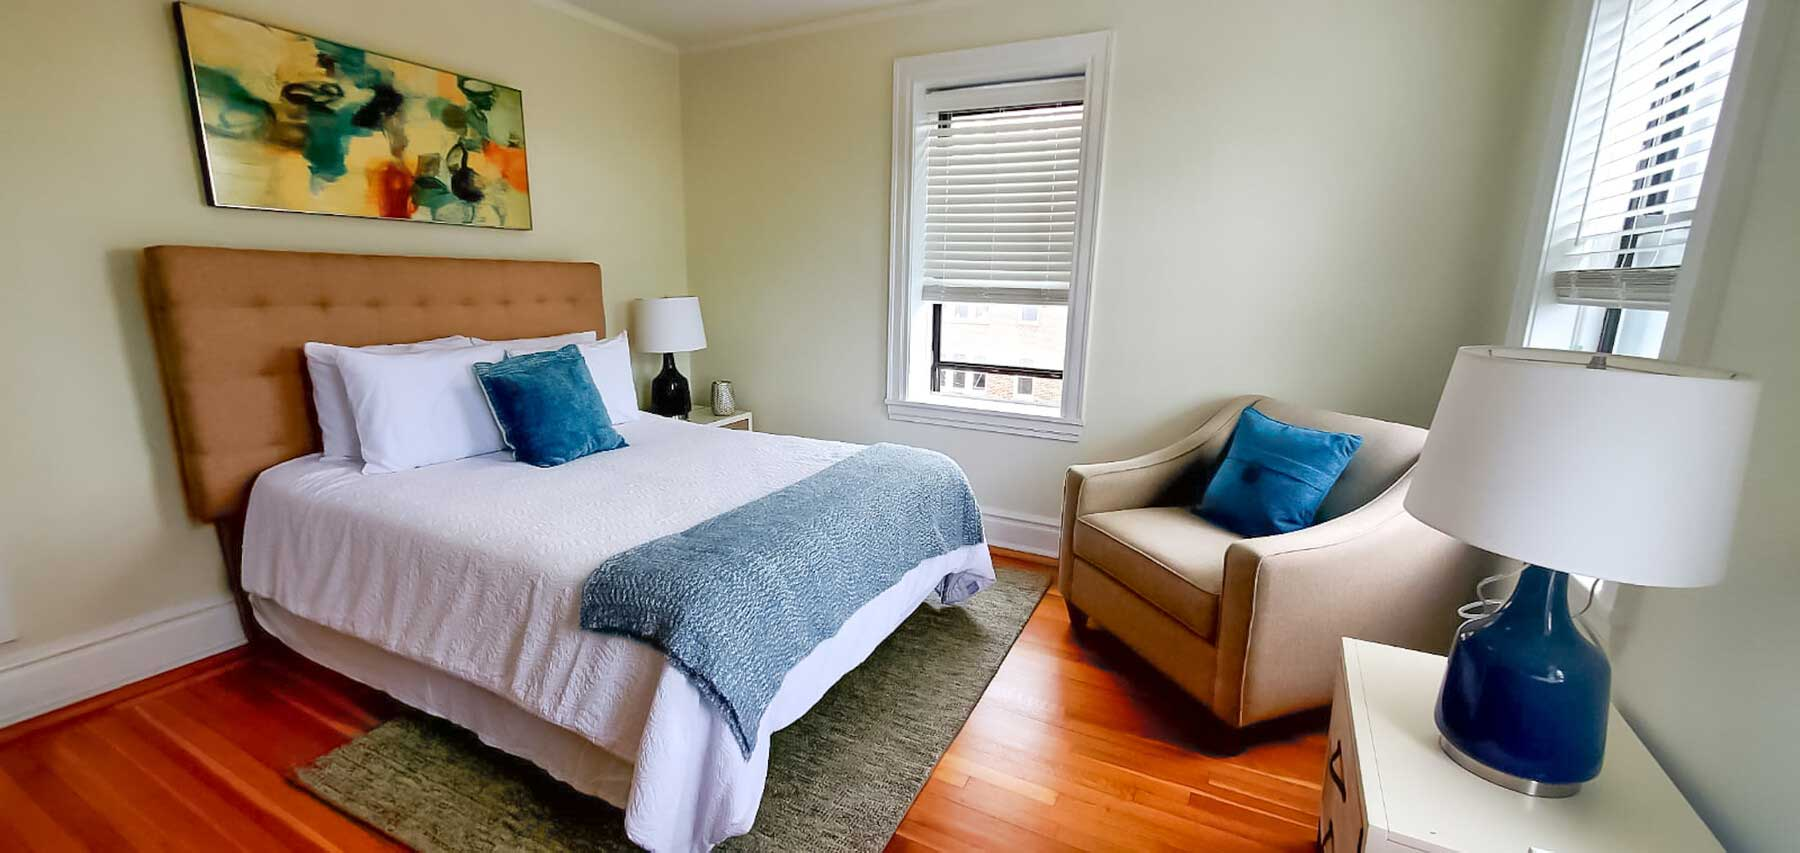 Bedroom at Montclair Gardens Apartments in Montclair, New Jersey